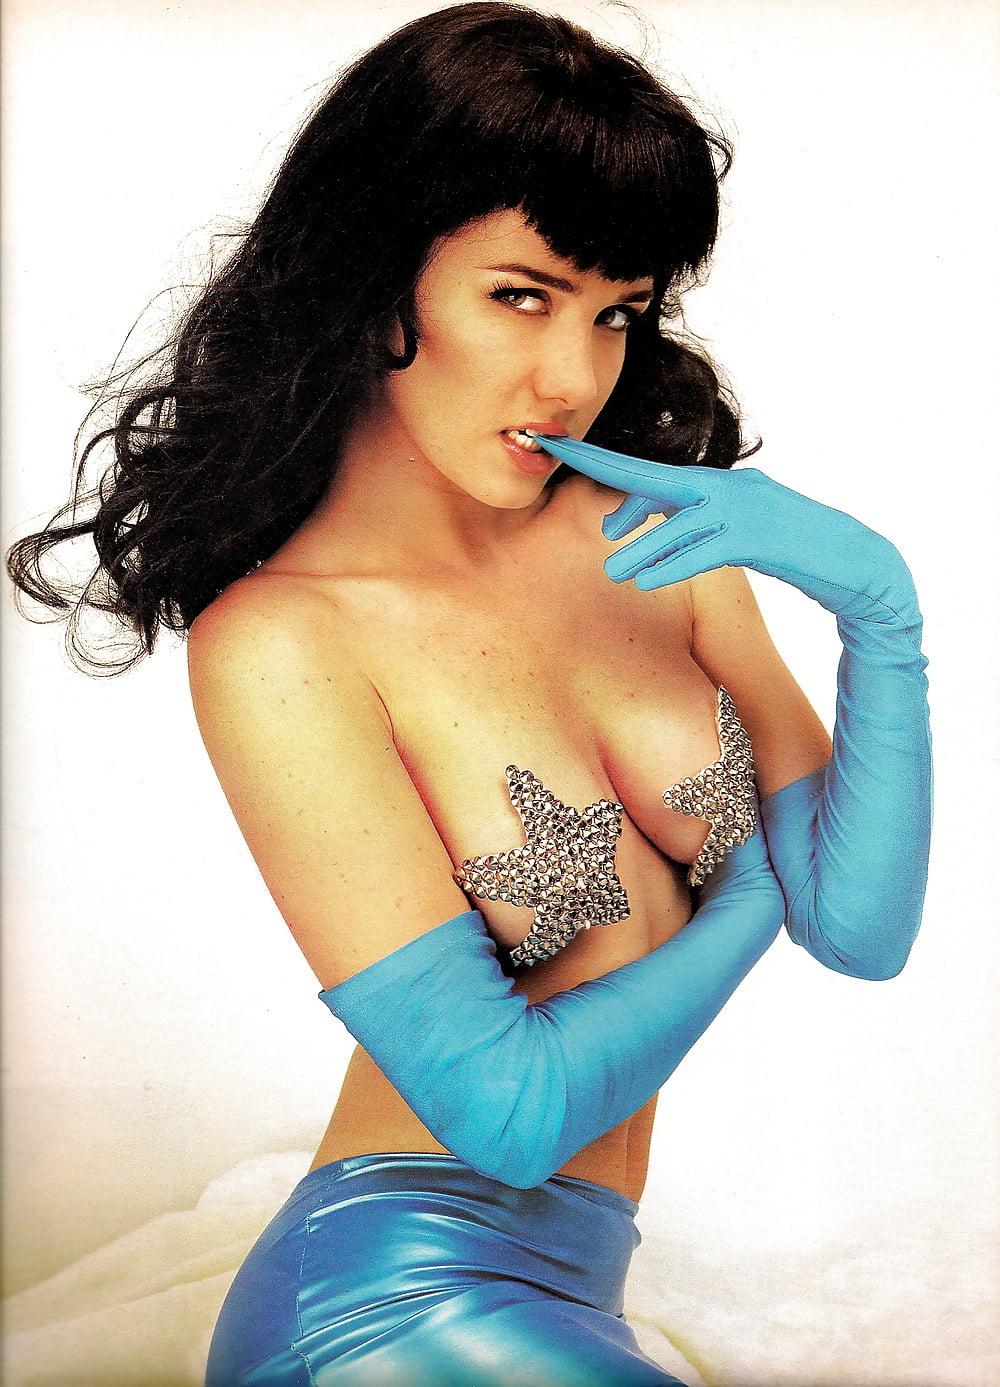 Natalia oreiro pieces of the past erotic photos of celebrities and sexy actresses